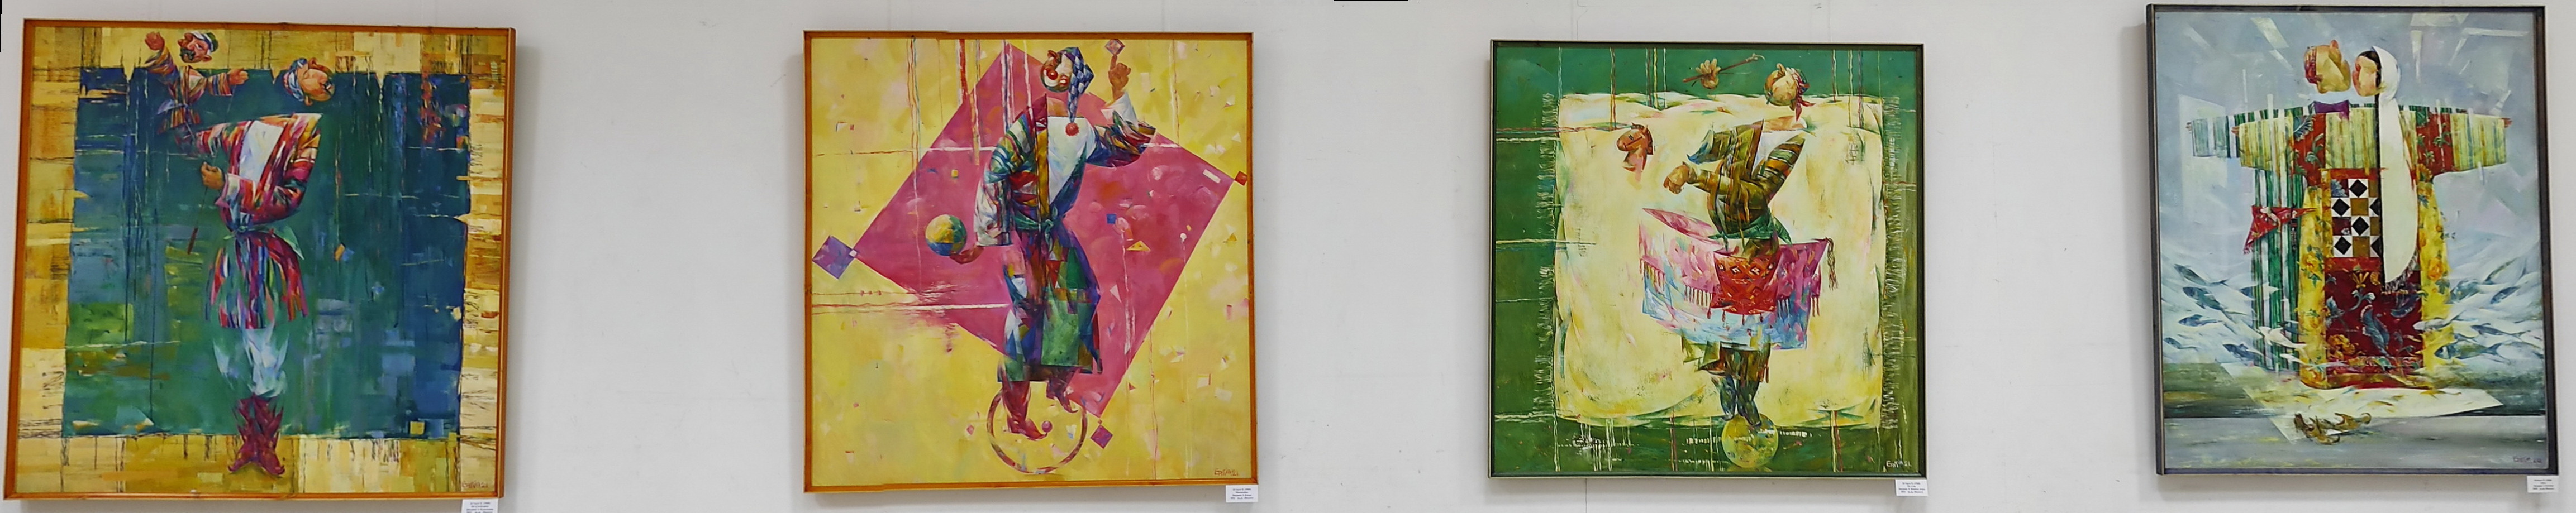 Эркин Джураев. Экспозиция картин. Кукольник, Клоун, Конные игры. 2021